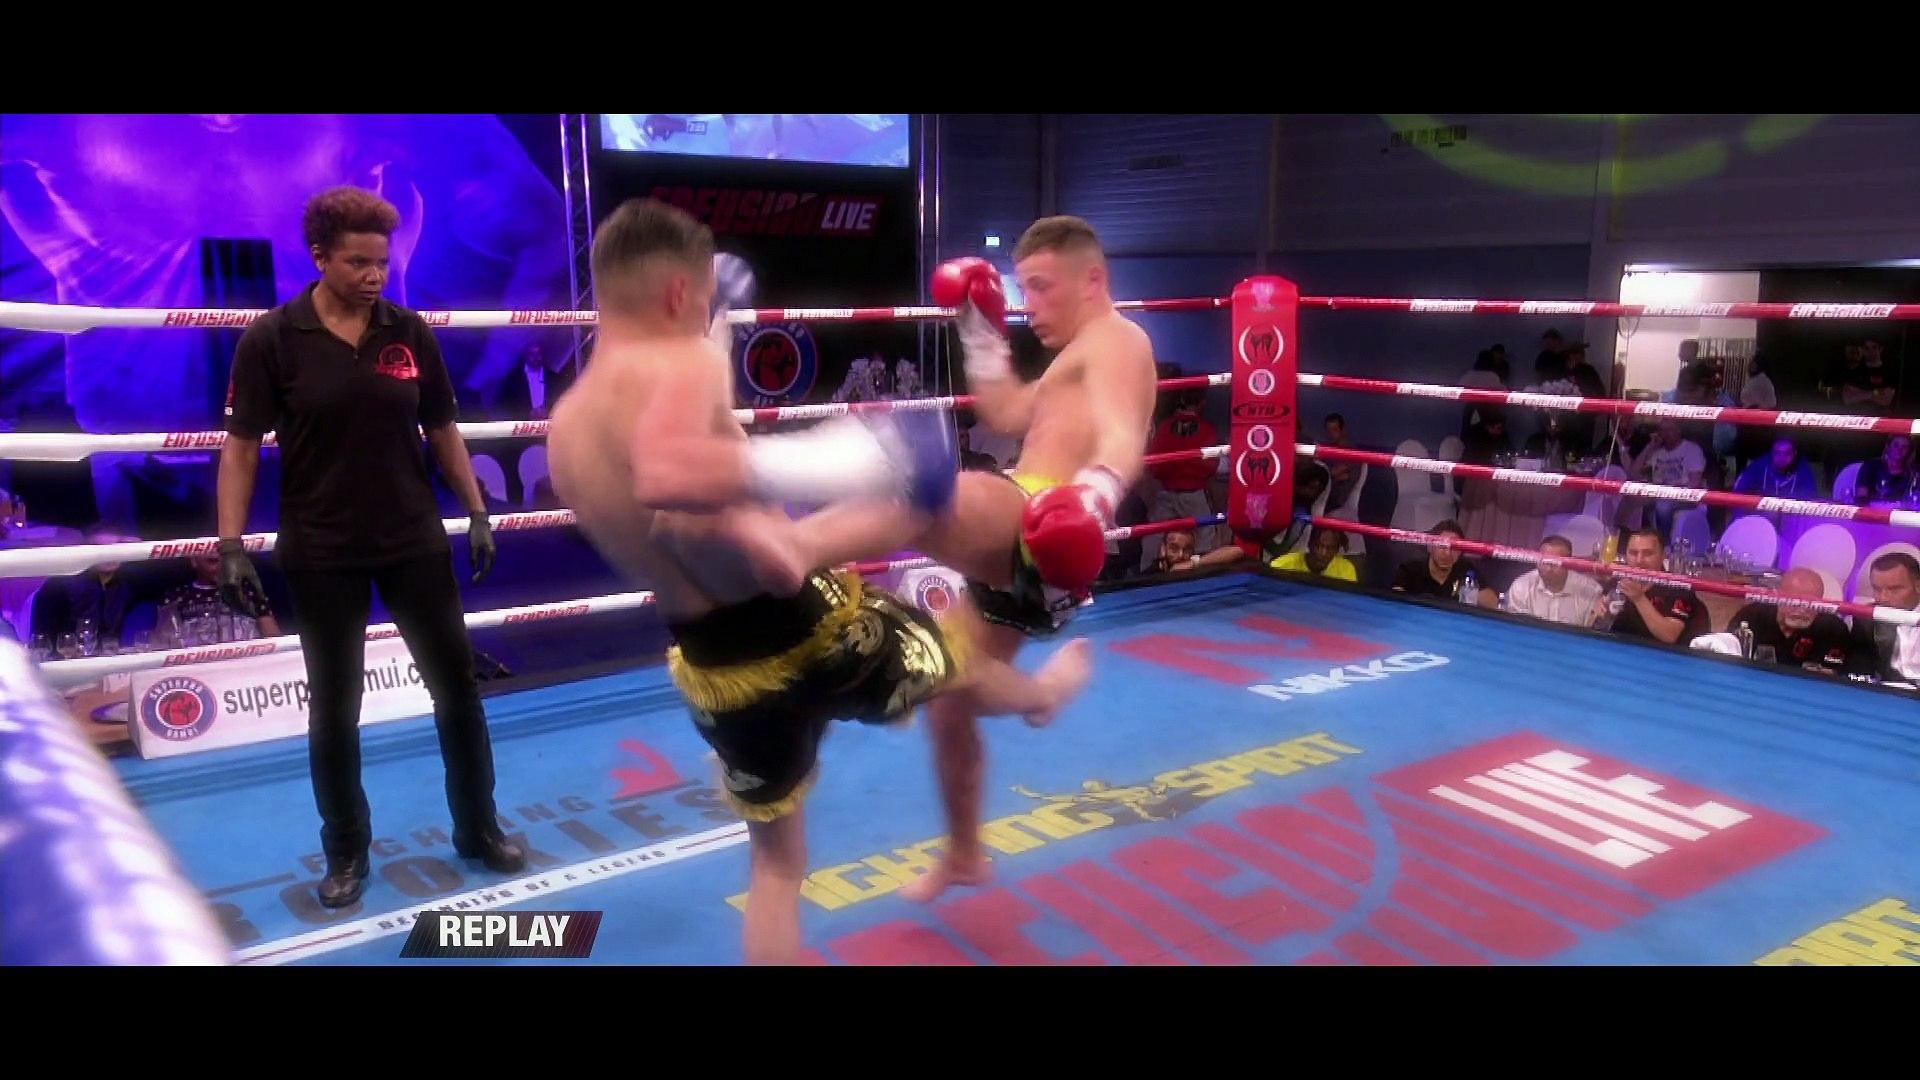 Clip - Kickboxing Talents